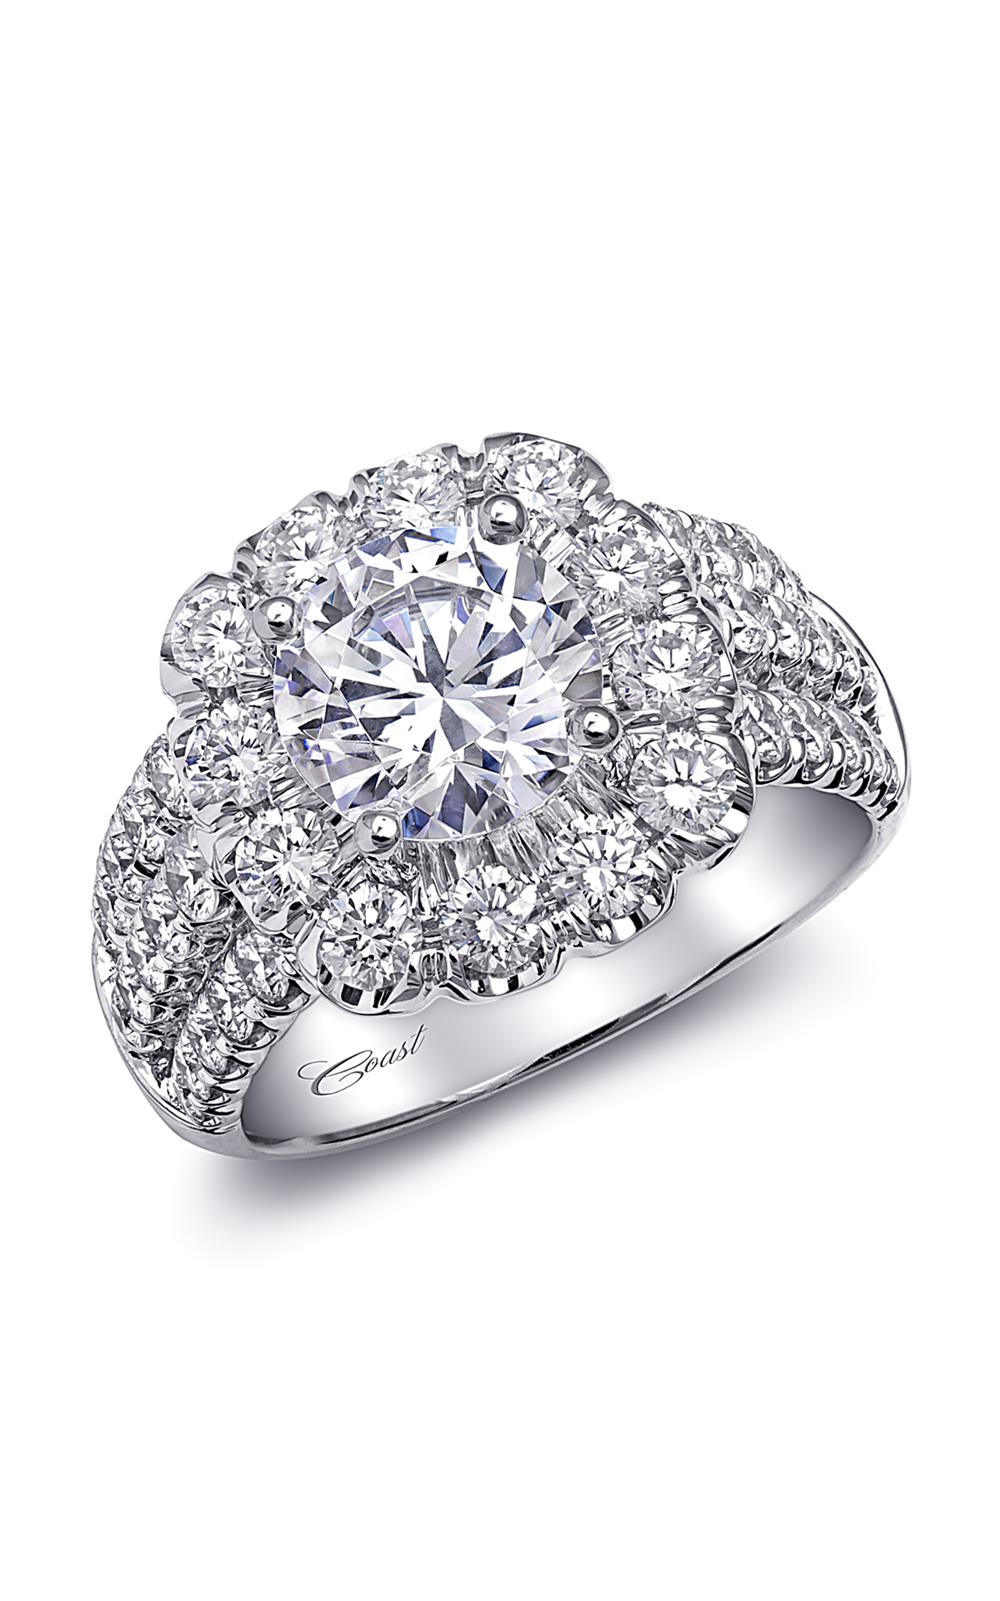 Coast Diamond Charisma LS10139 product image